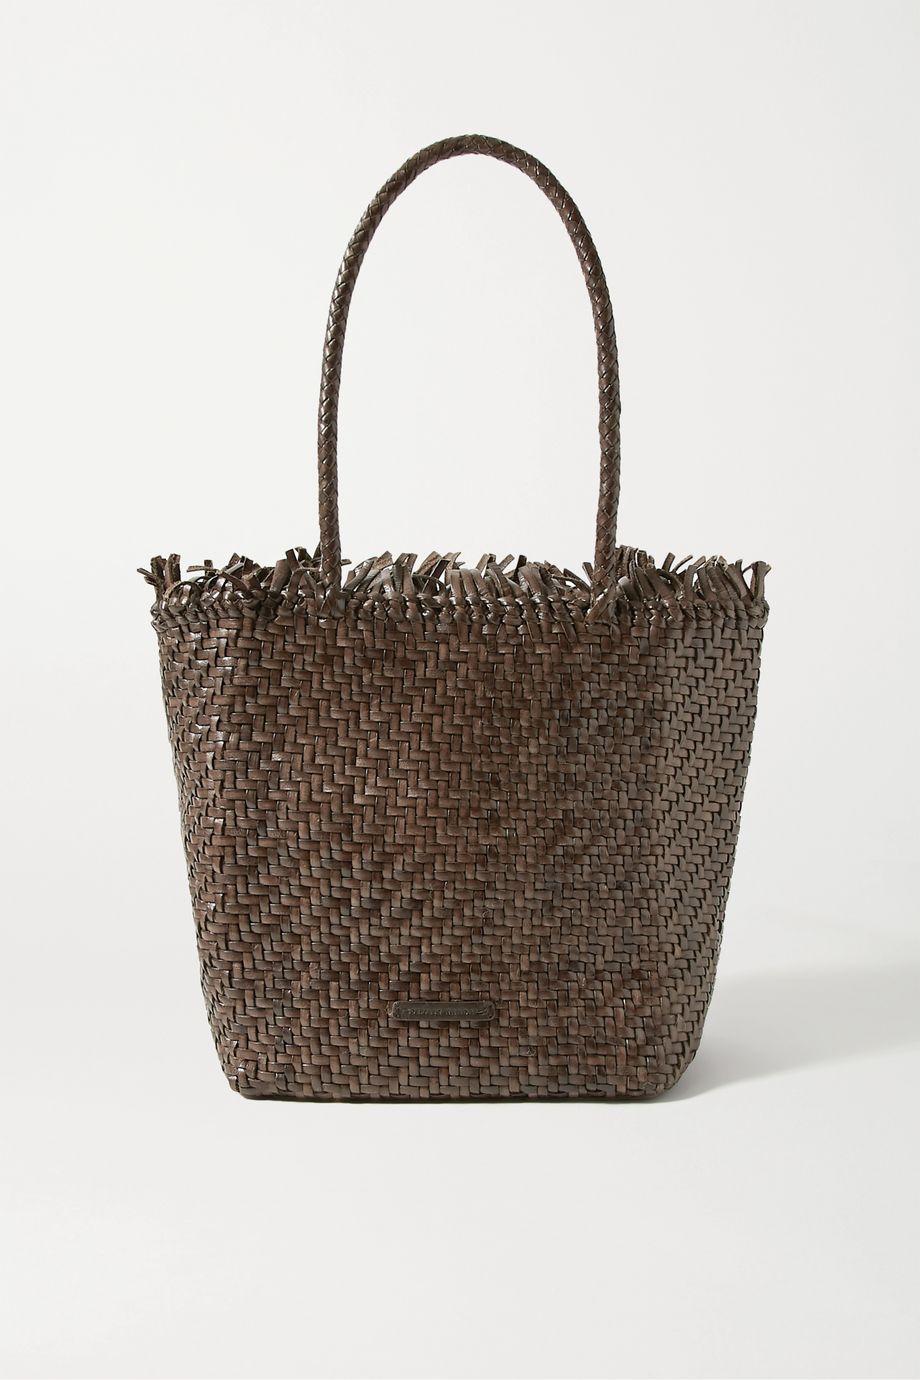 Loeffler Randall Maya fringed woven leather tote